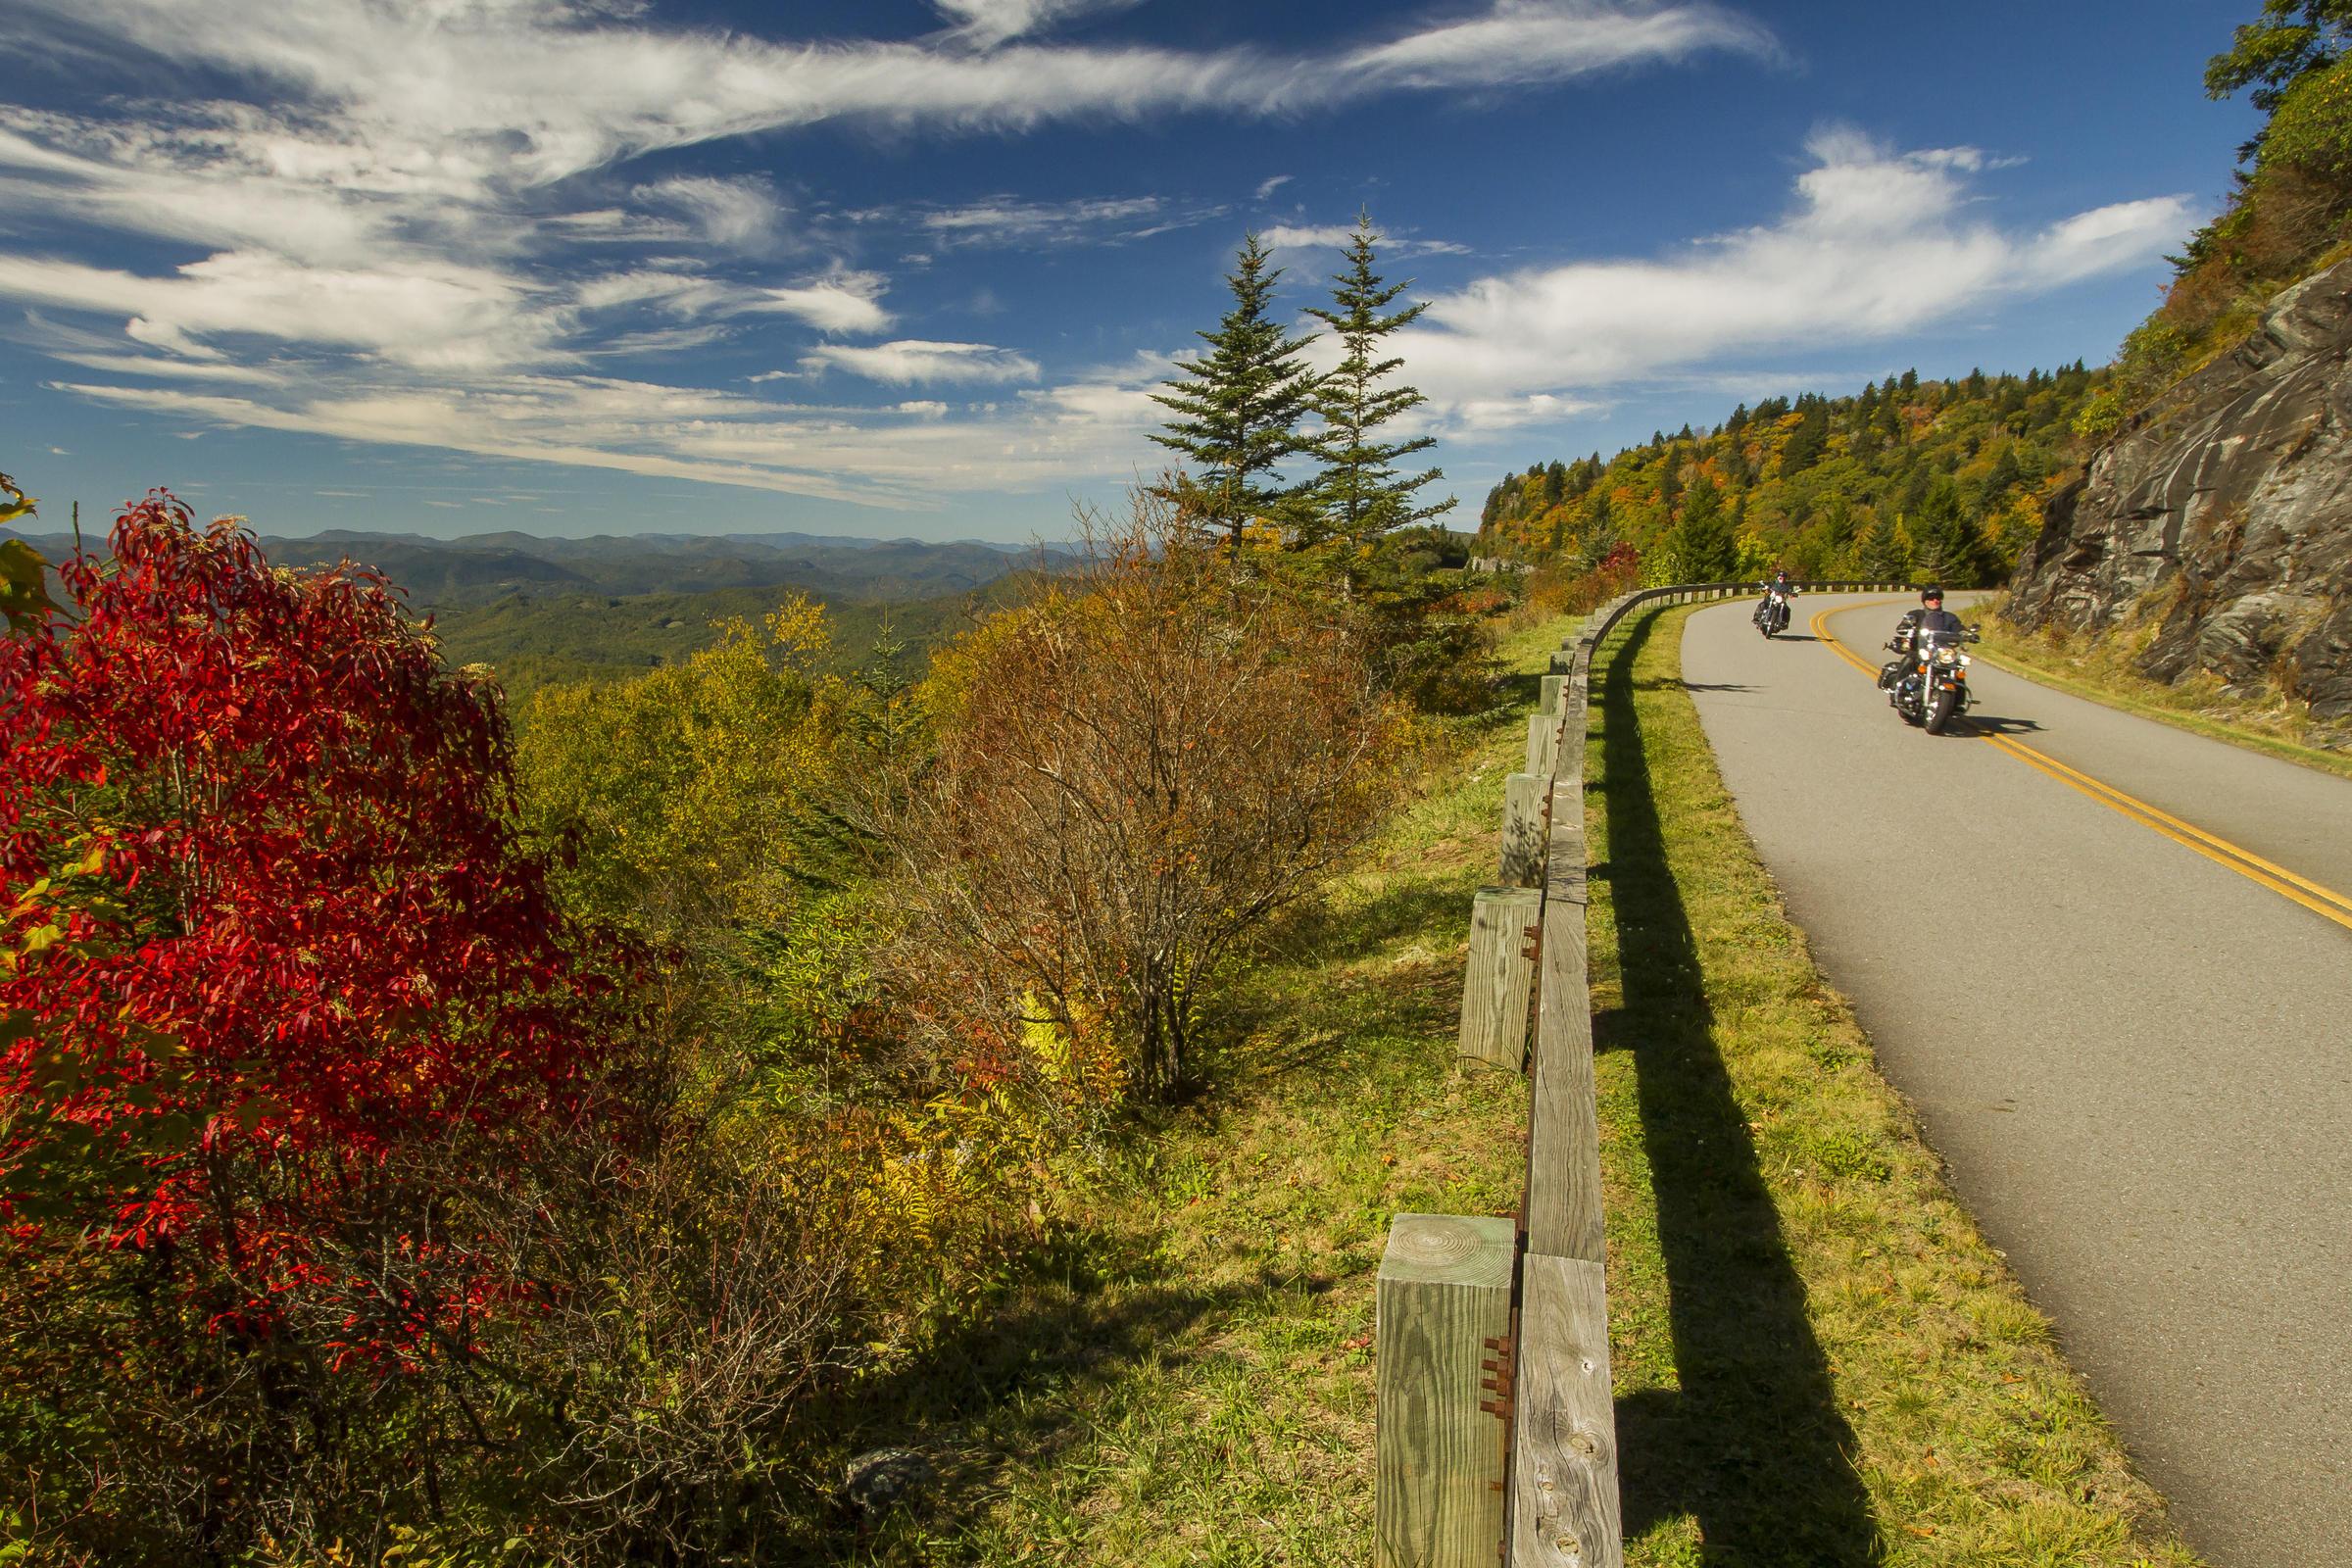 PHOTOS: A Hint Of Fall Along The Blue Ridge Parkway | WUNC